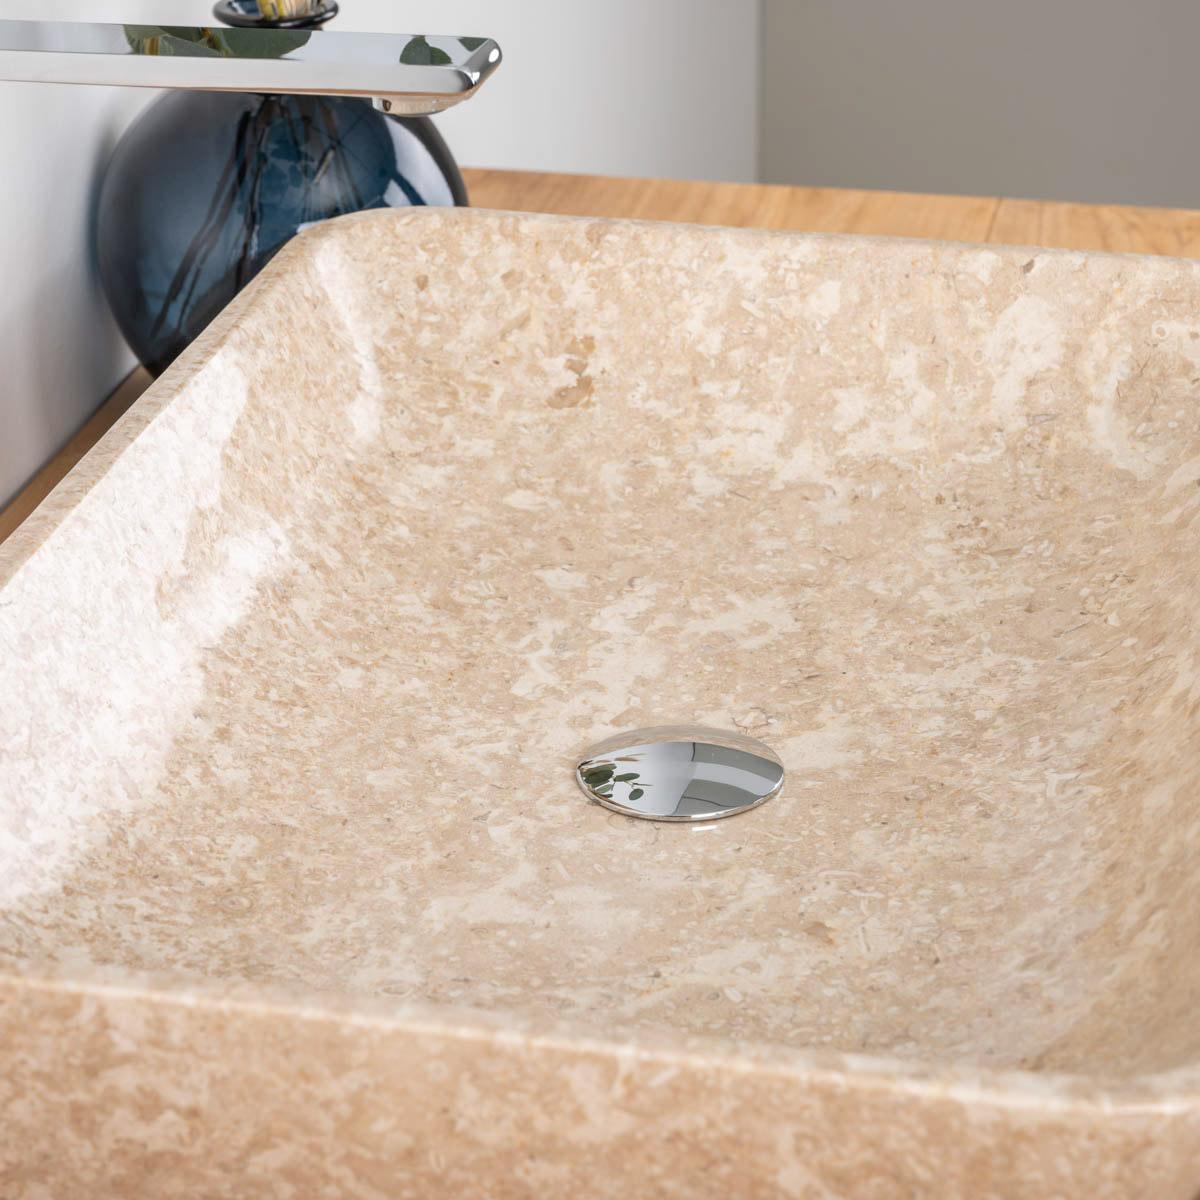 vasque de salle de bain en marbre carmen cr me 60cm. Black Bedroom Furniture Sets. Home Design Ideas